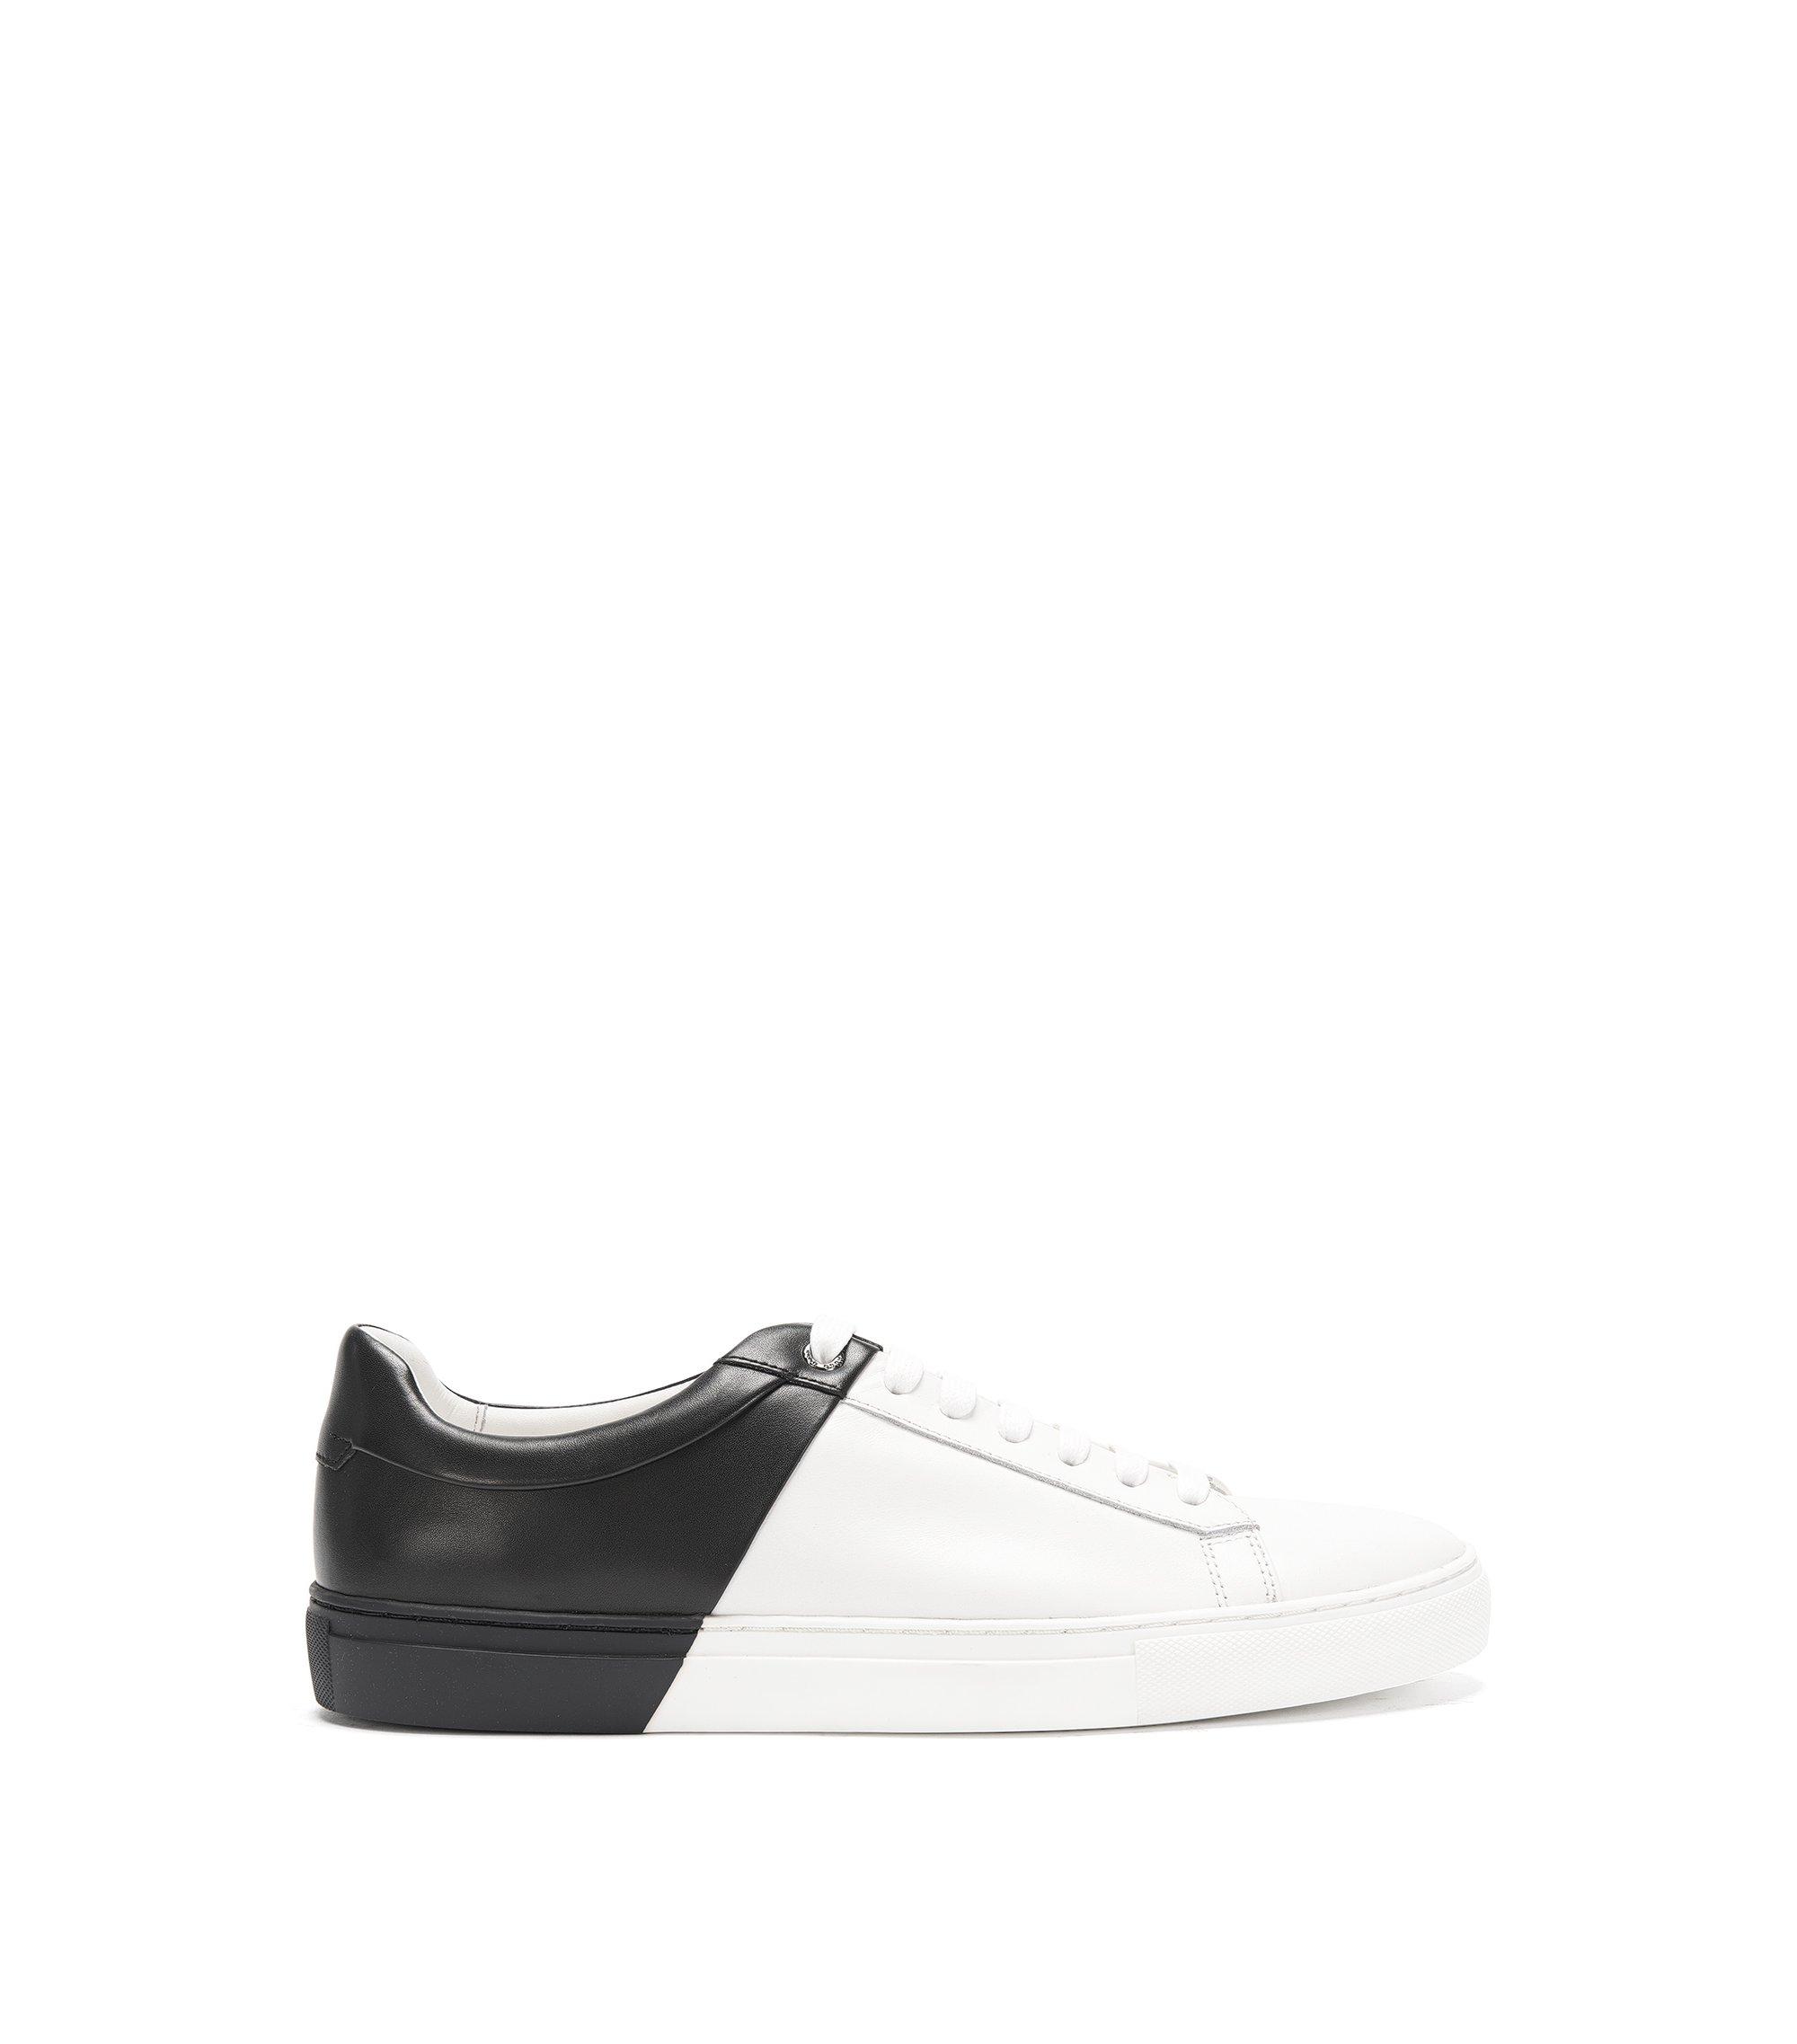 Calfskin Dual-Tone Sneaker | Timeless Tenn ltbc, Black